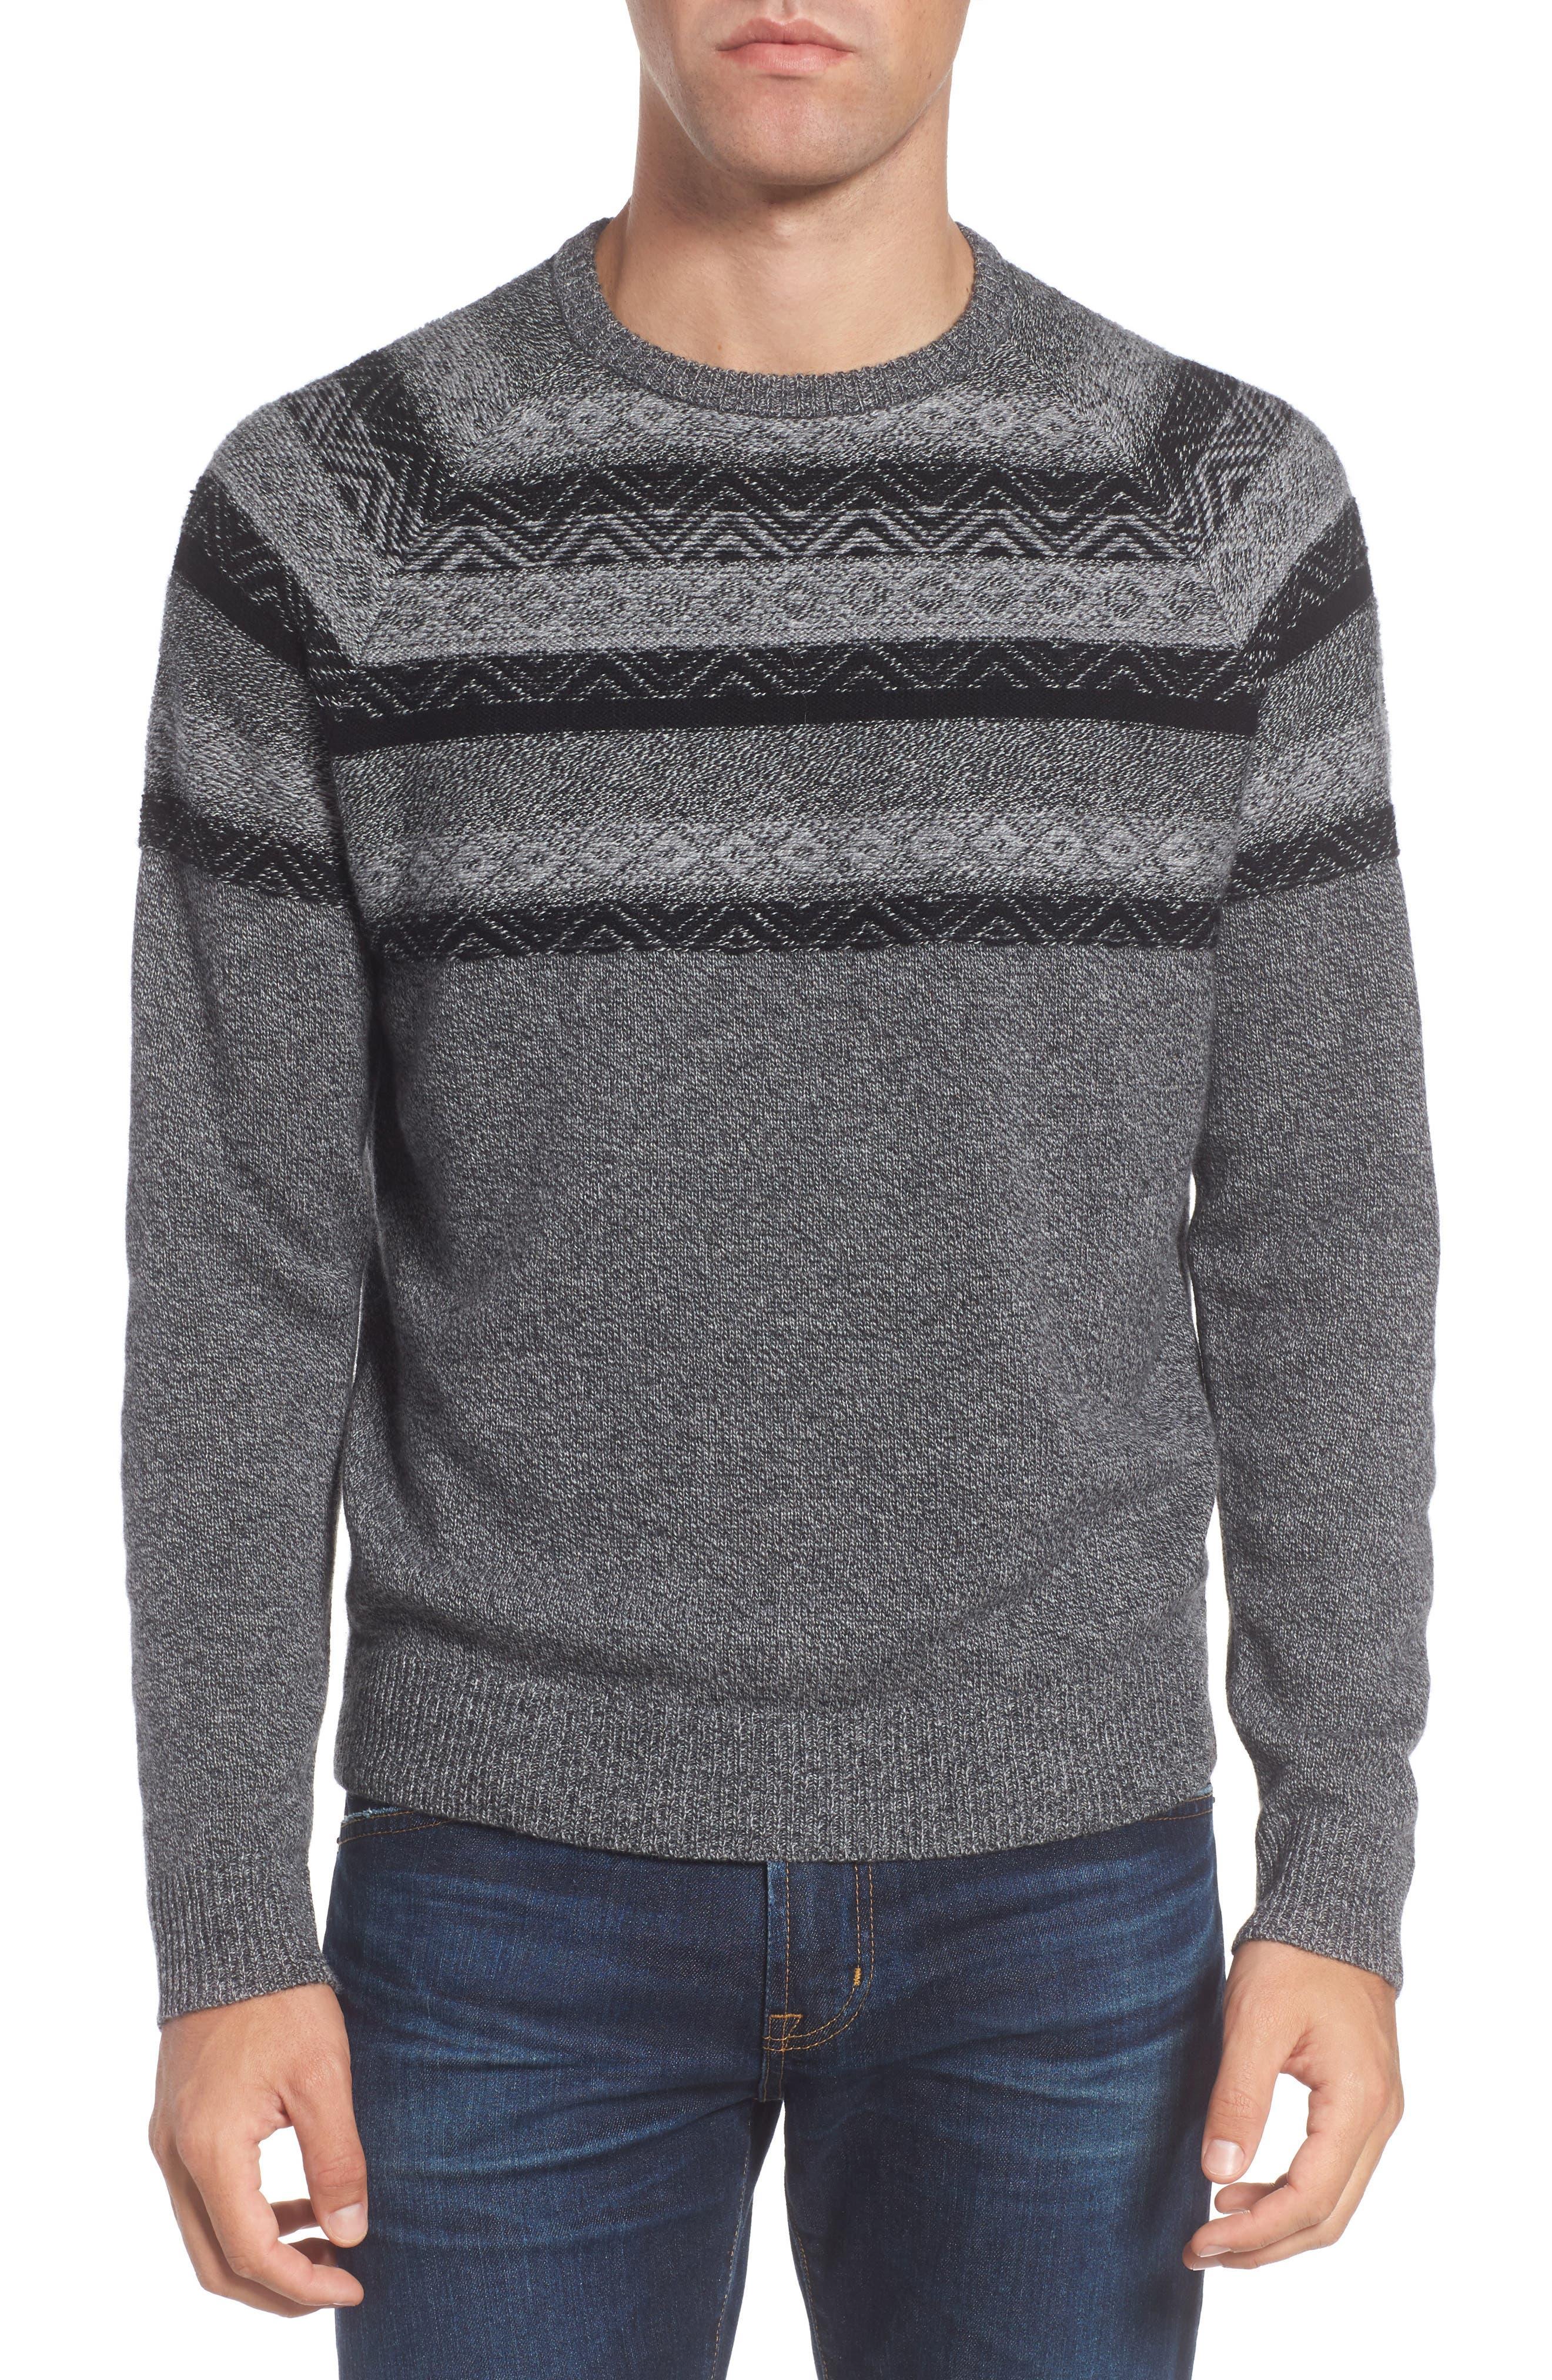 Main Image - Nordstrom Men's Shop Pattern Wool & Cashmere Sweater